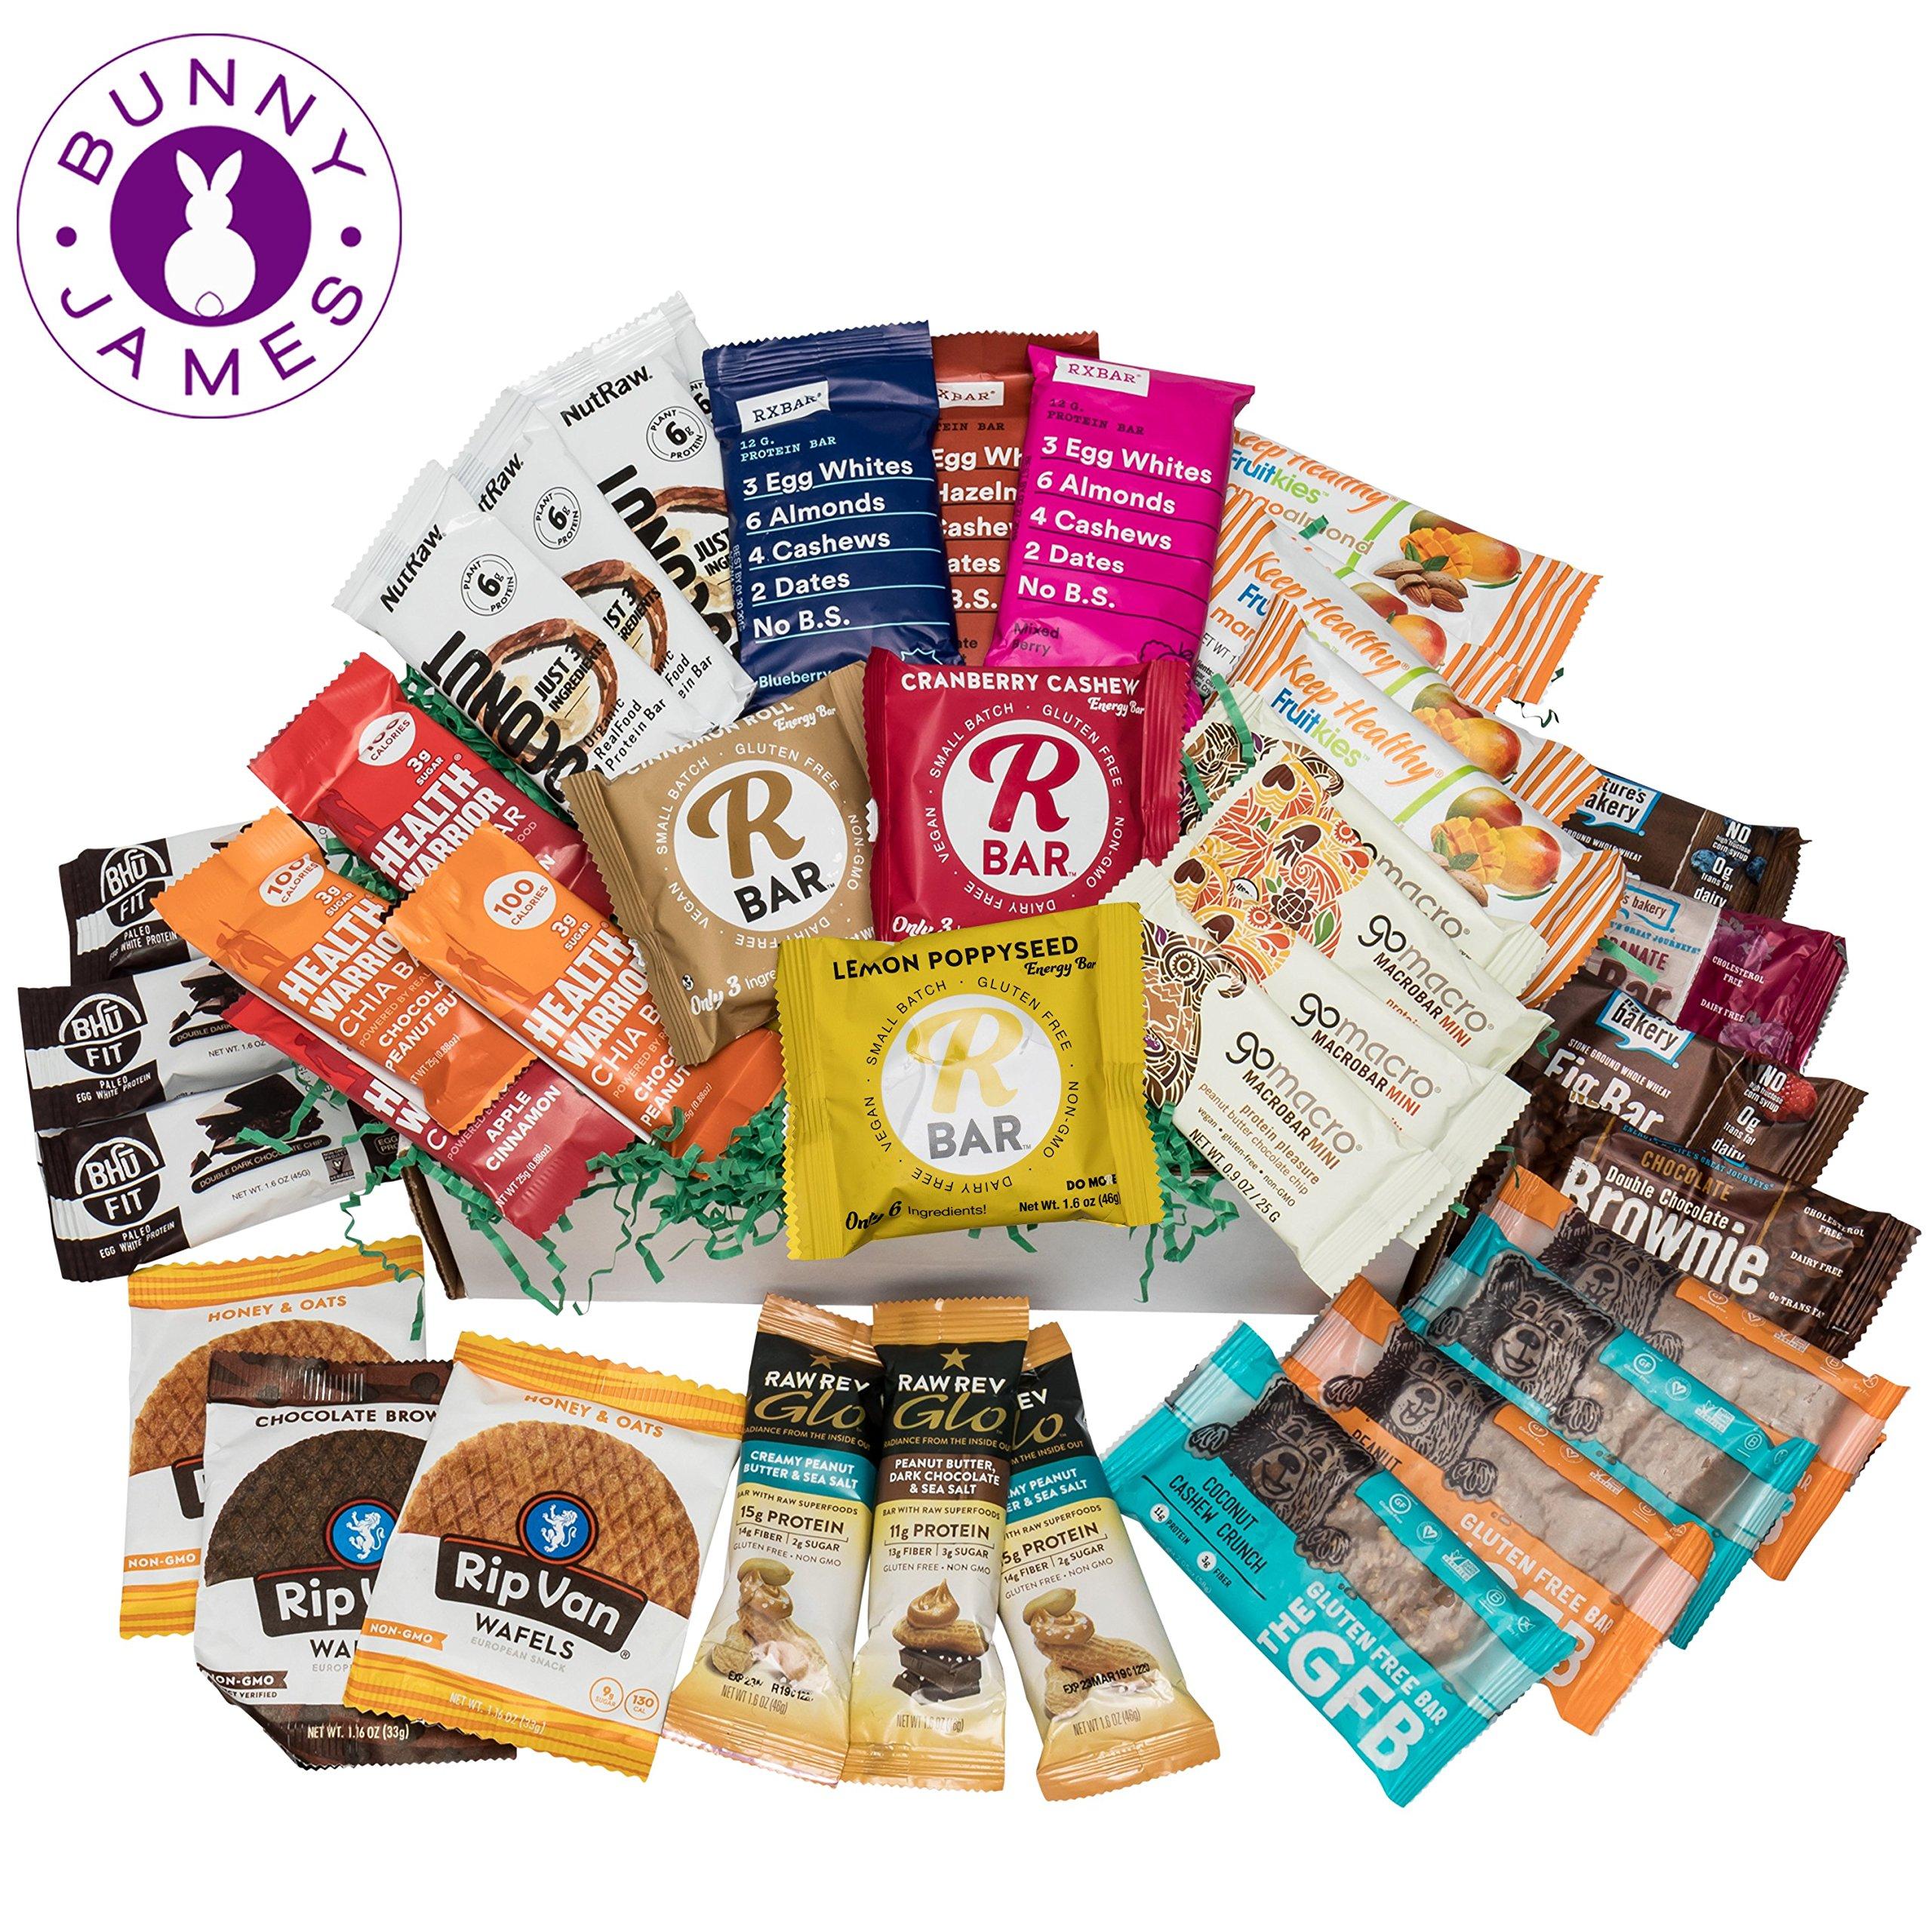 Healthy Snack Bars Sampler Box: Premium Mix Of Natural Organic Non-gmo High Protein Bars, Breakfast Bars, Energy Bars, Chia Bars, On The Go Snack Bars Variety Pack (40 Bars)